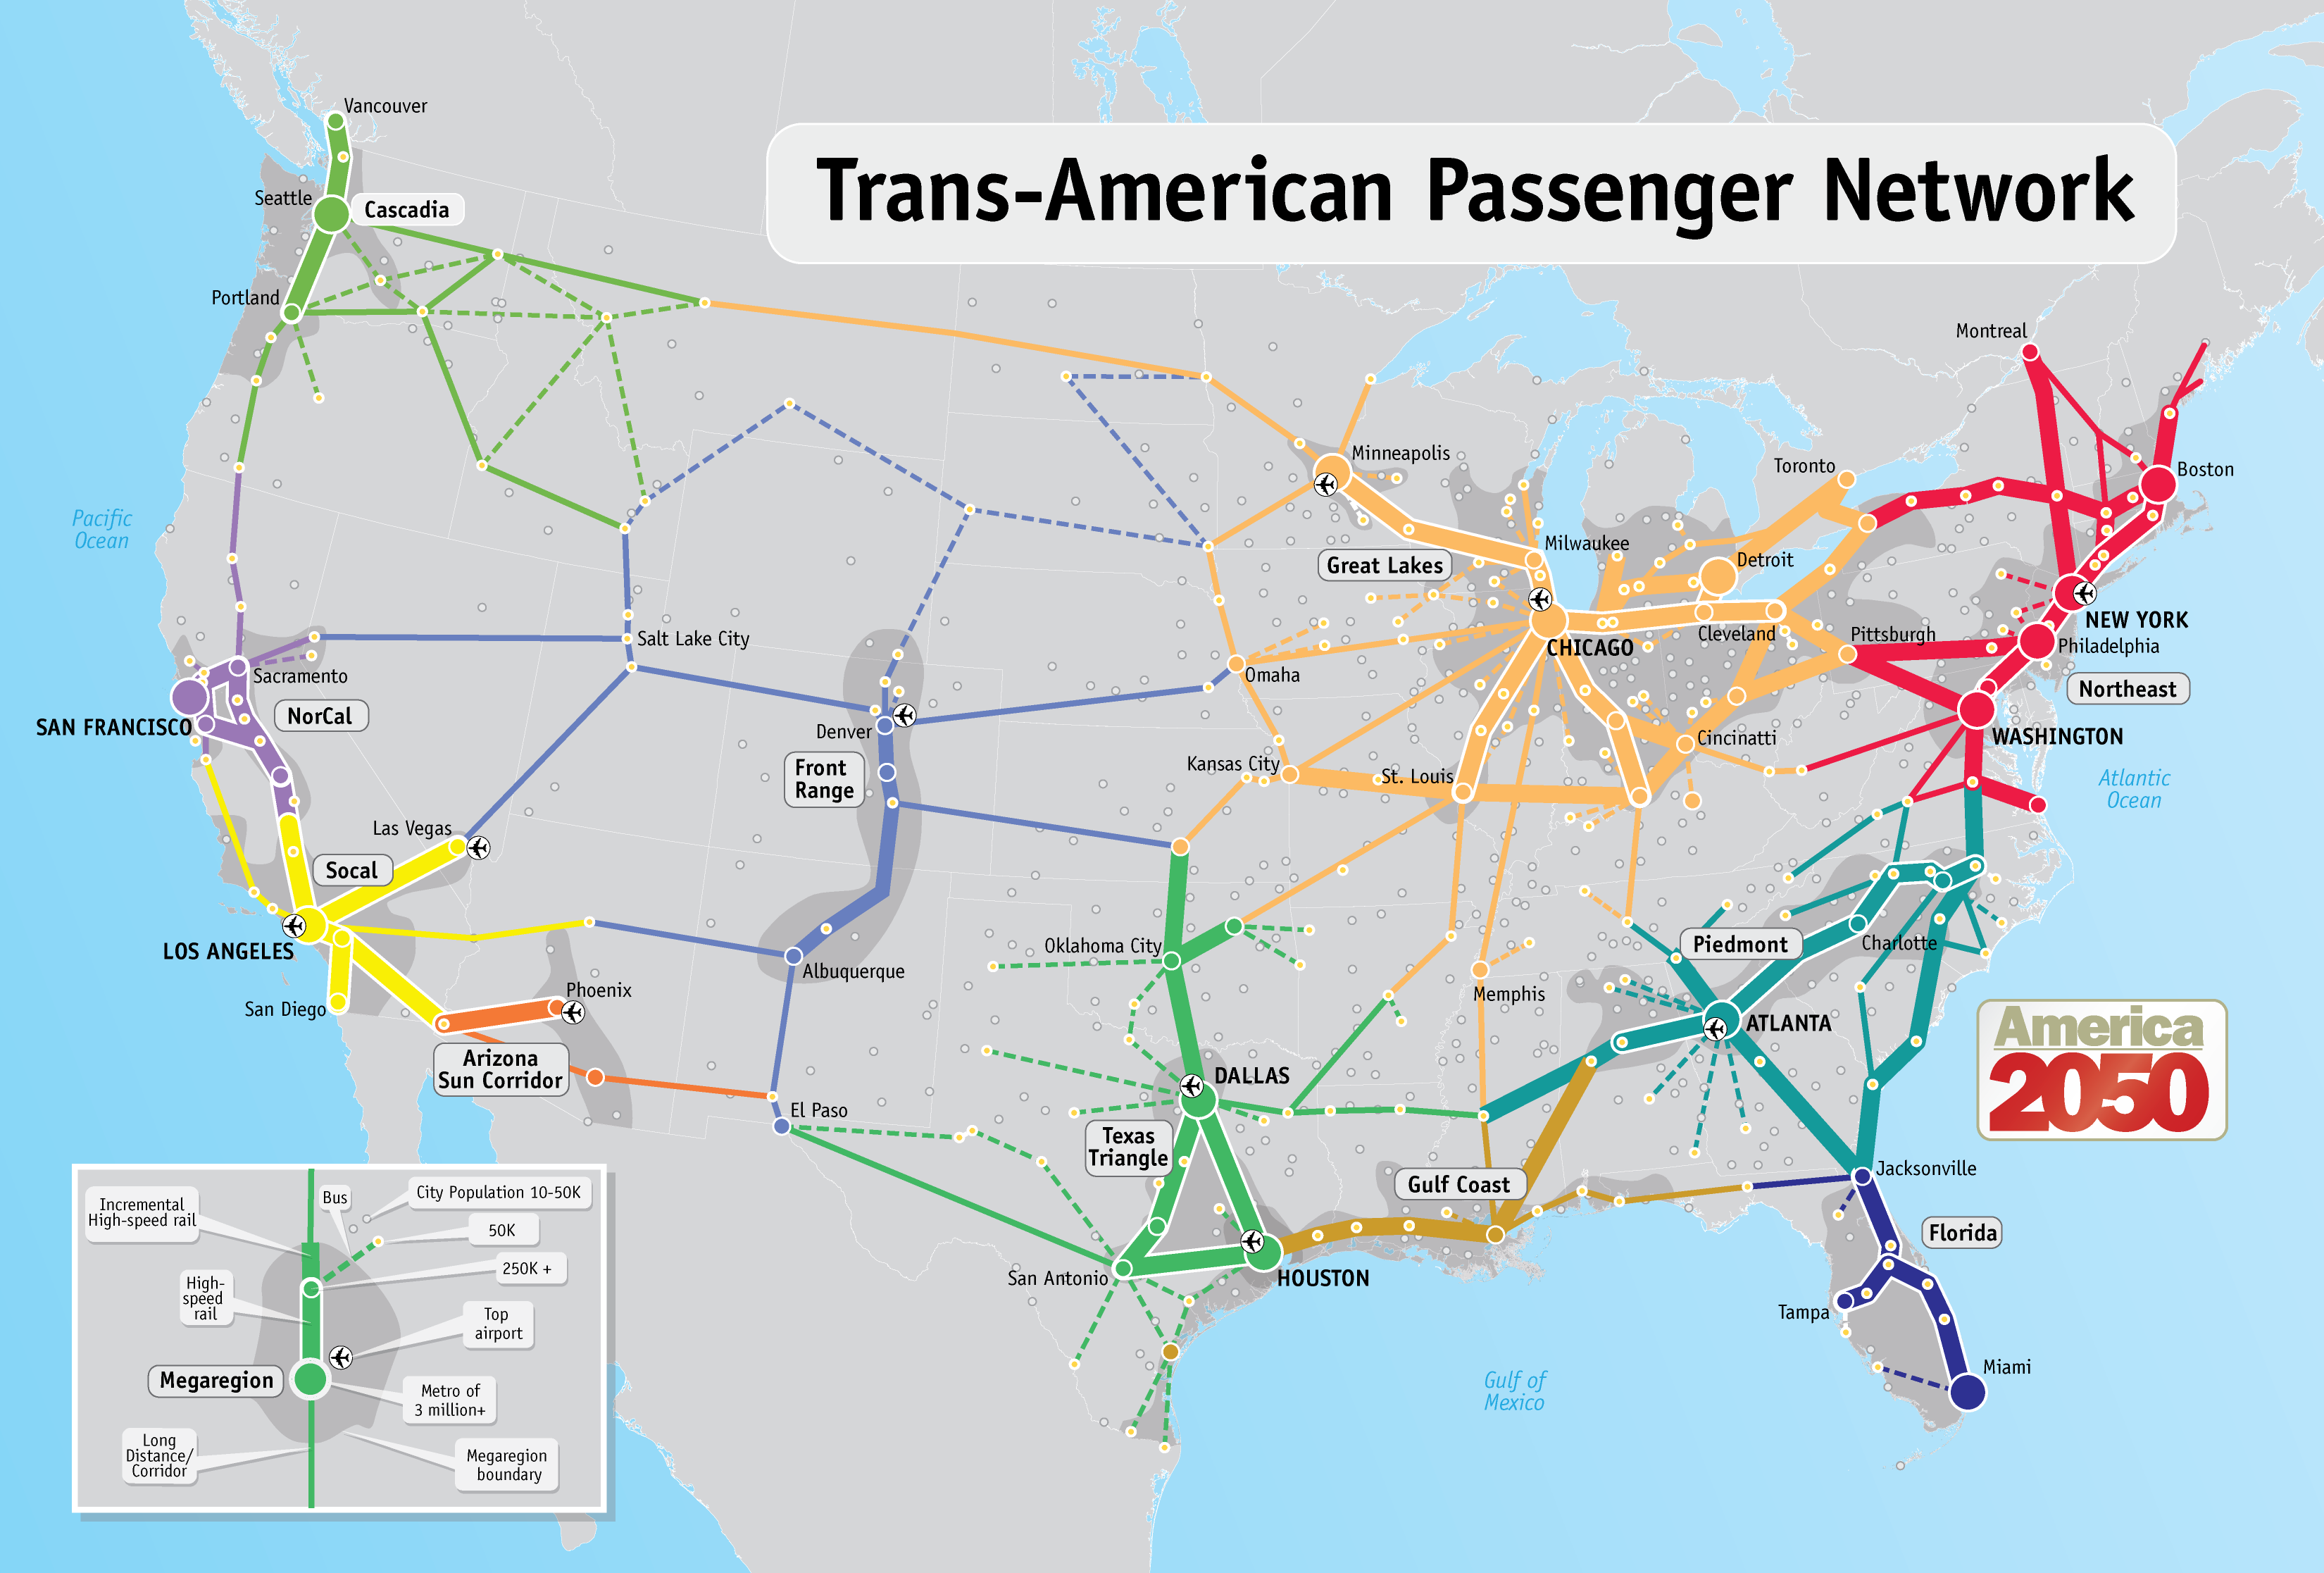 America 2050 Trans-American Passenger Network